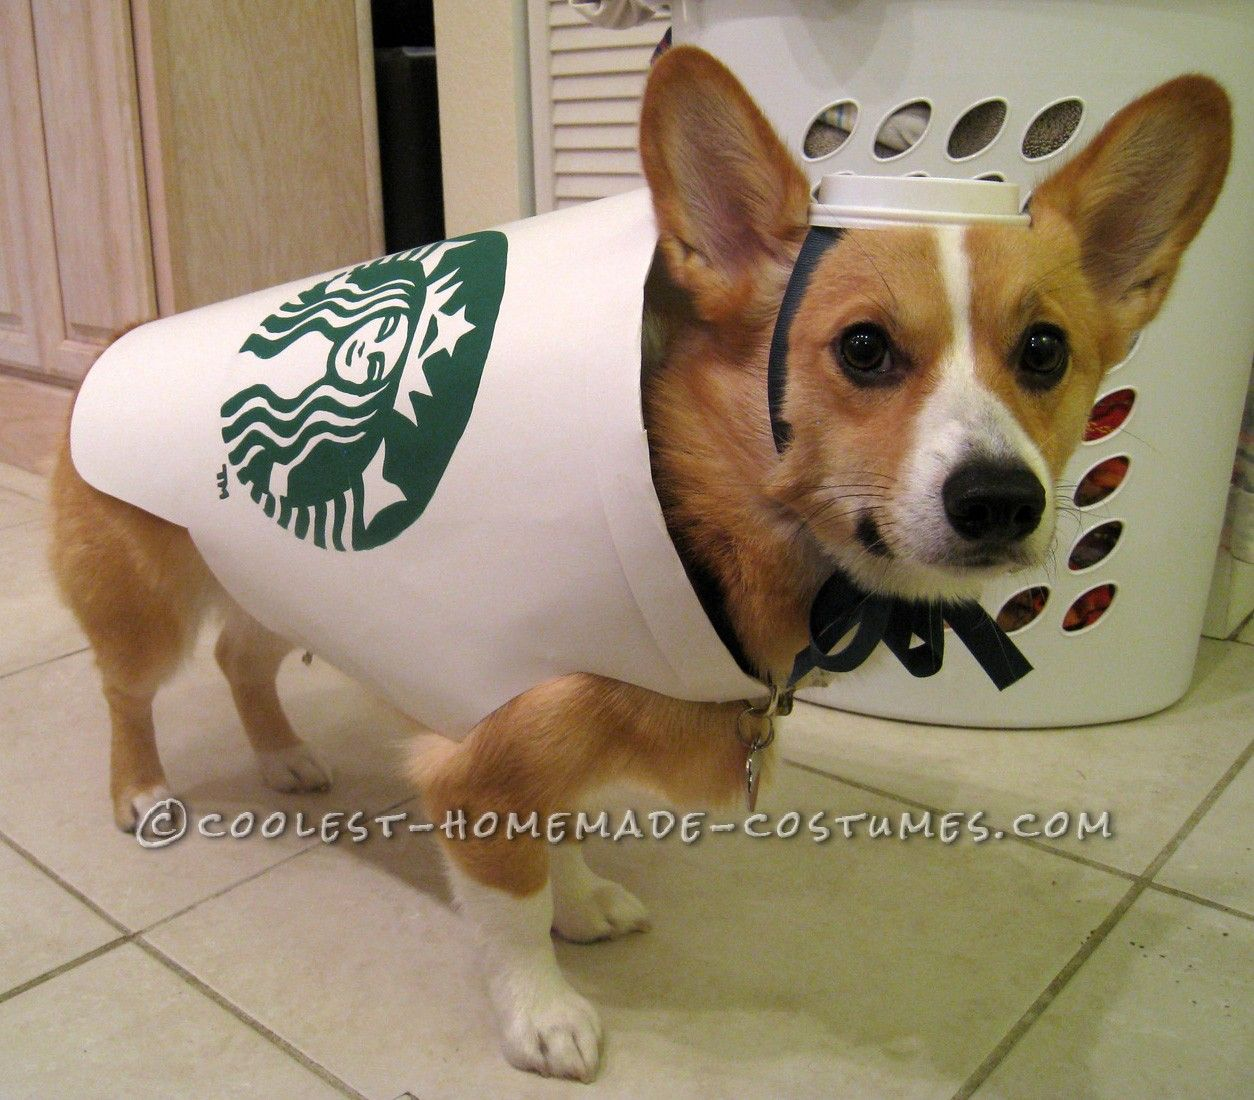 starbucks dog costume easy and inexpensive - How To Make A Dog Halloween Costume